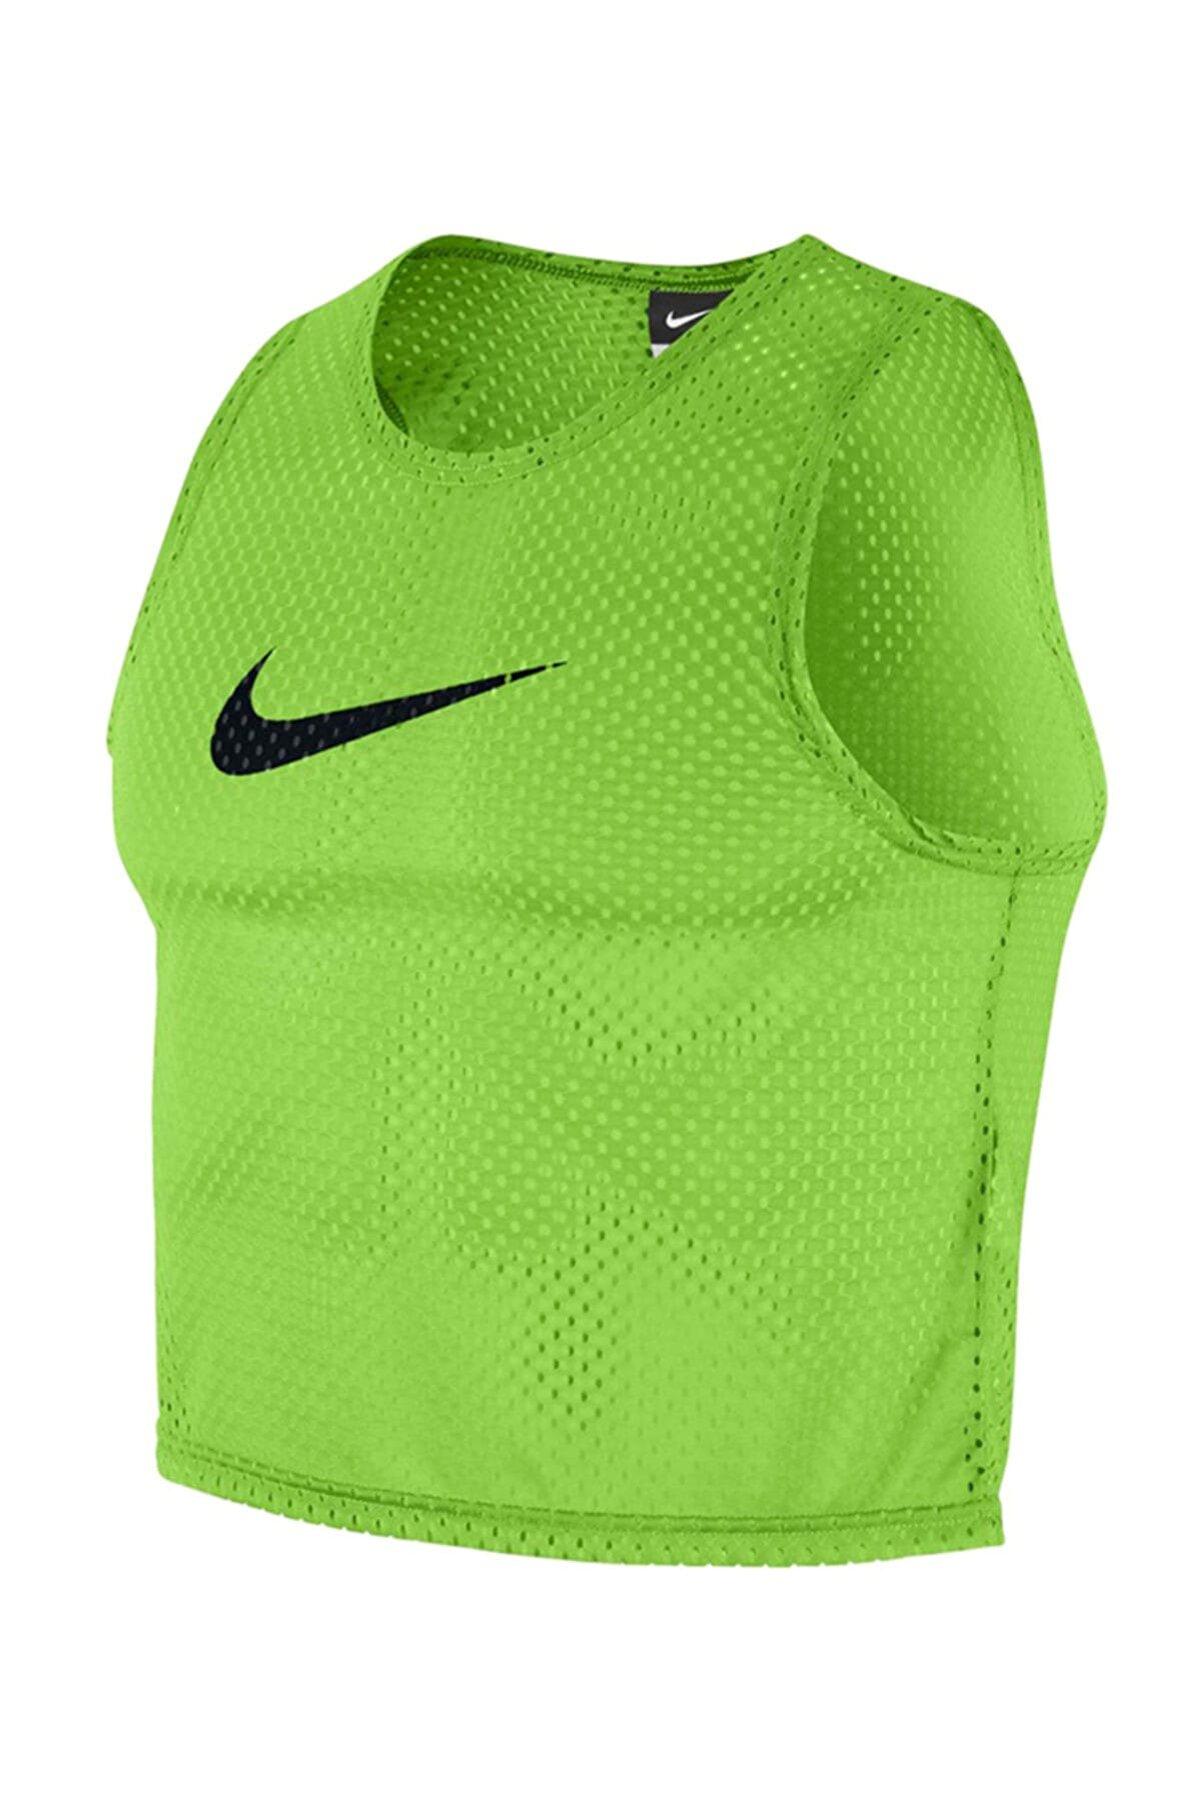 Nike 910936-313 Training Bib  Antrenman Yeleği